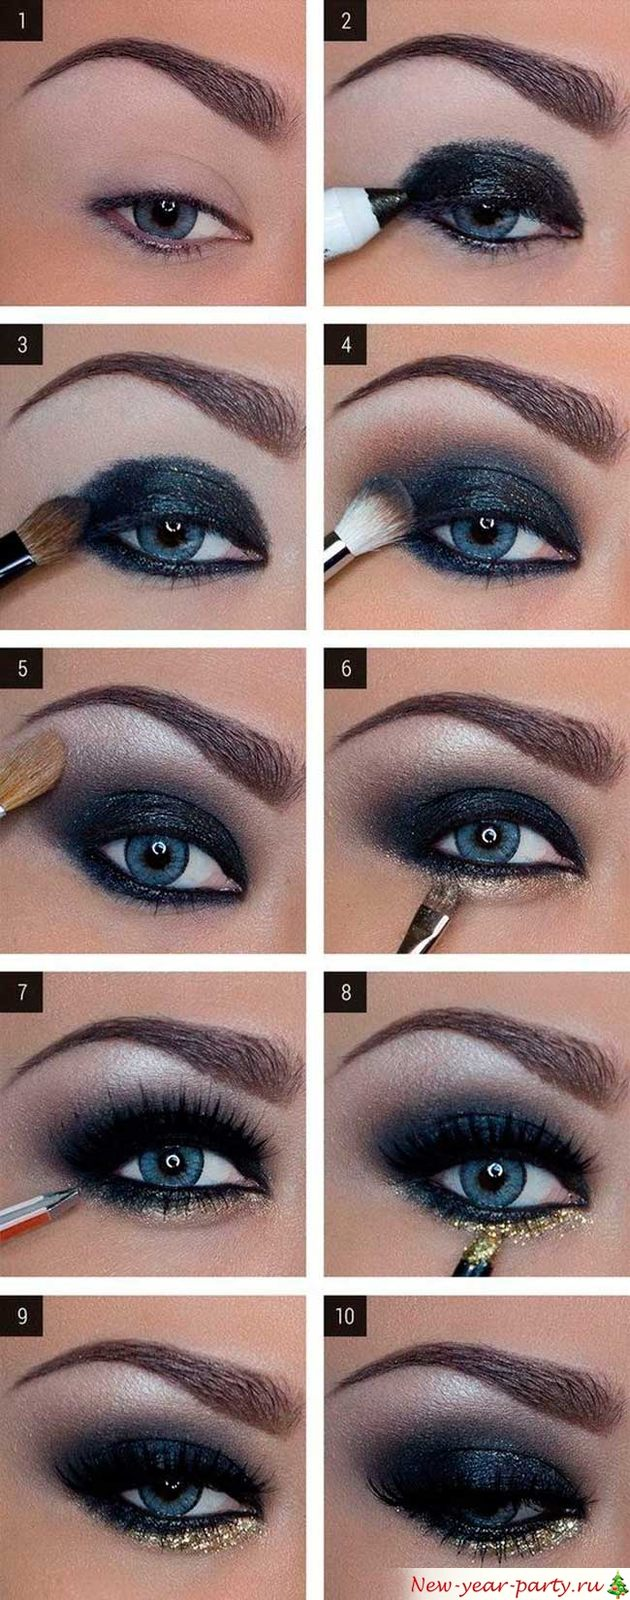 Для синих глаз